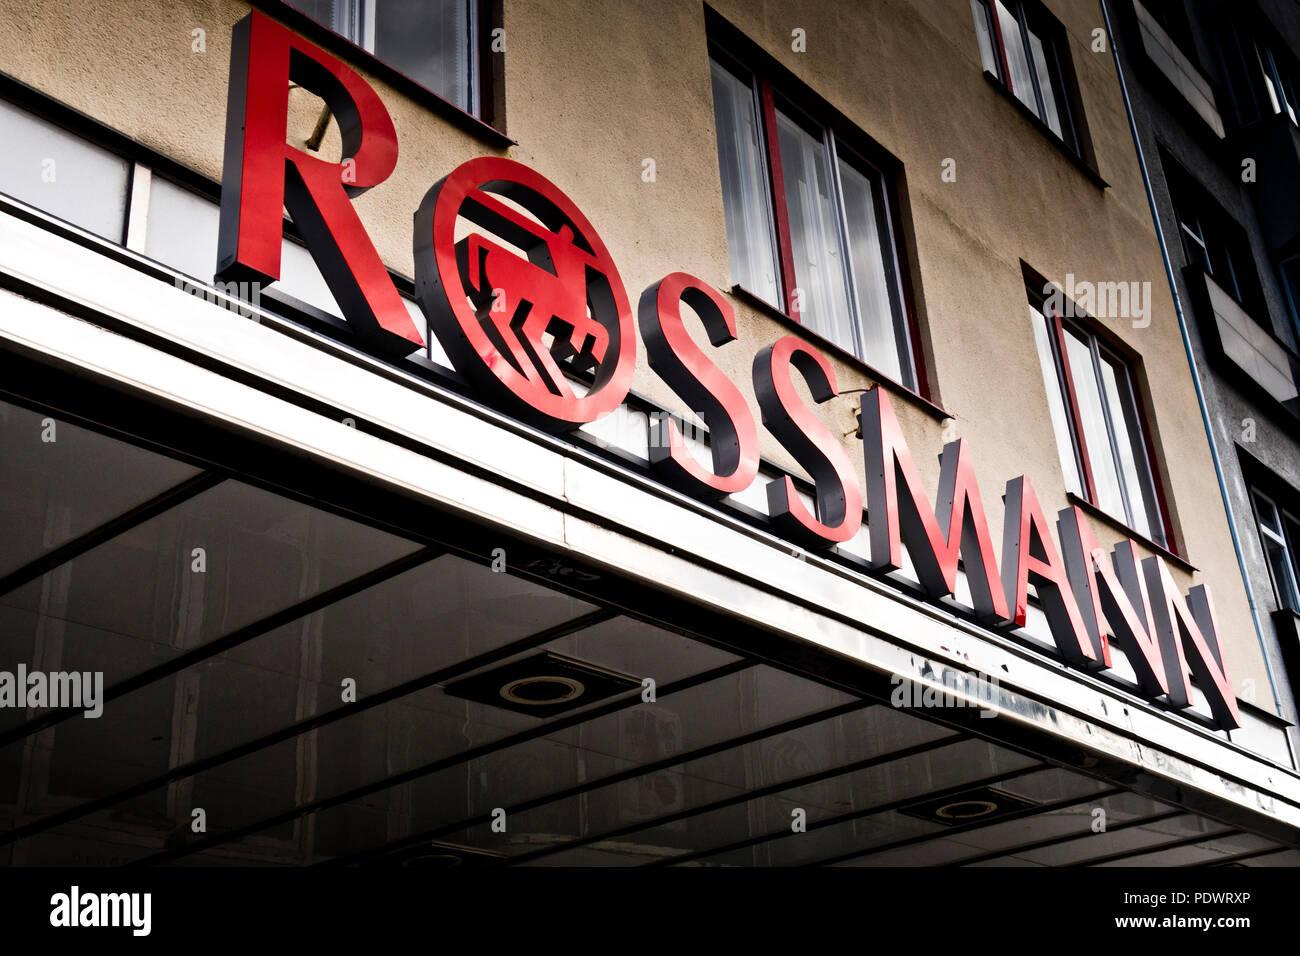 Rossmann drug store chain sign - Stock Image